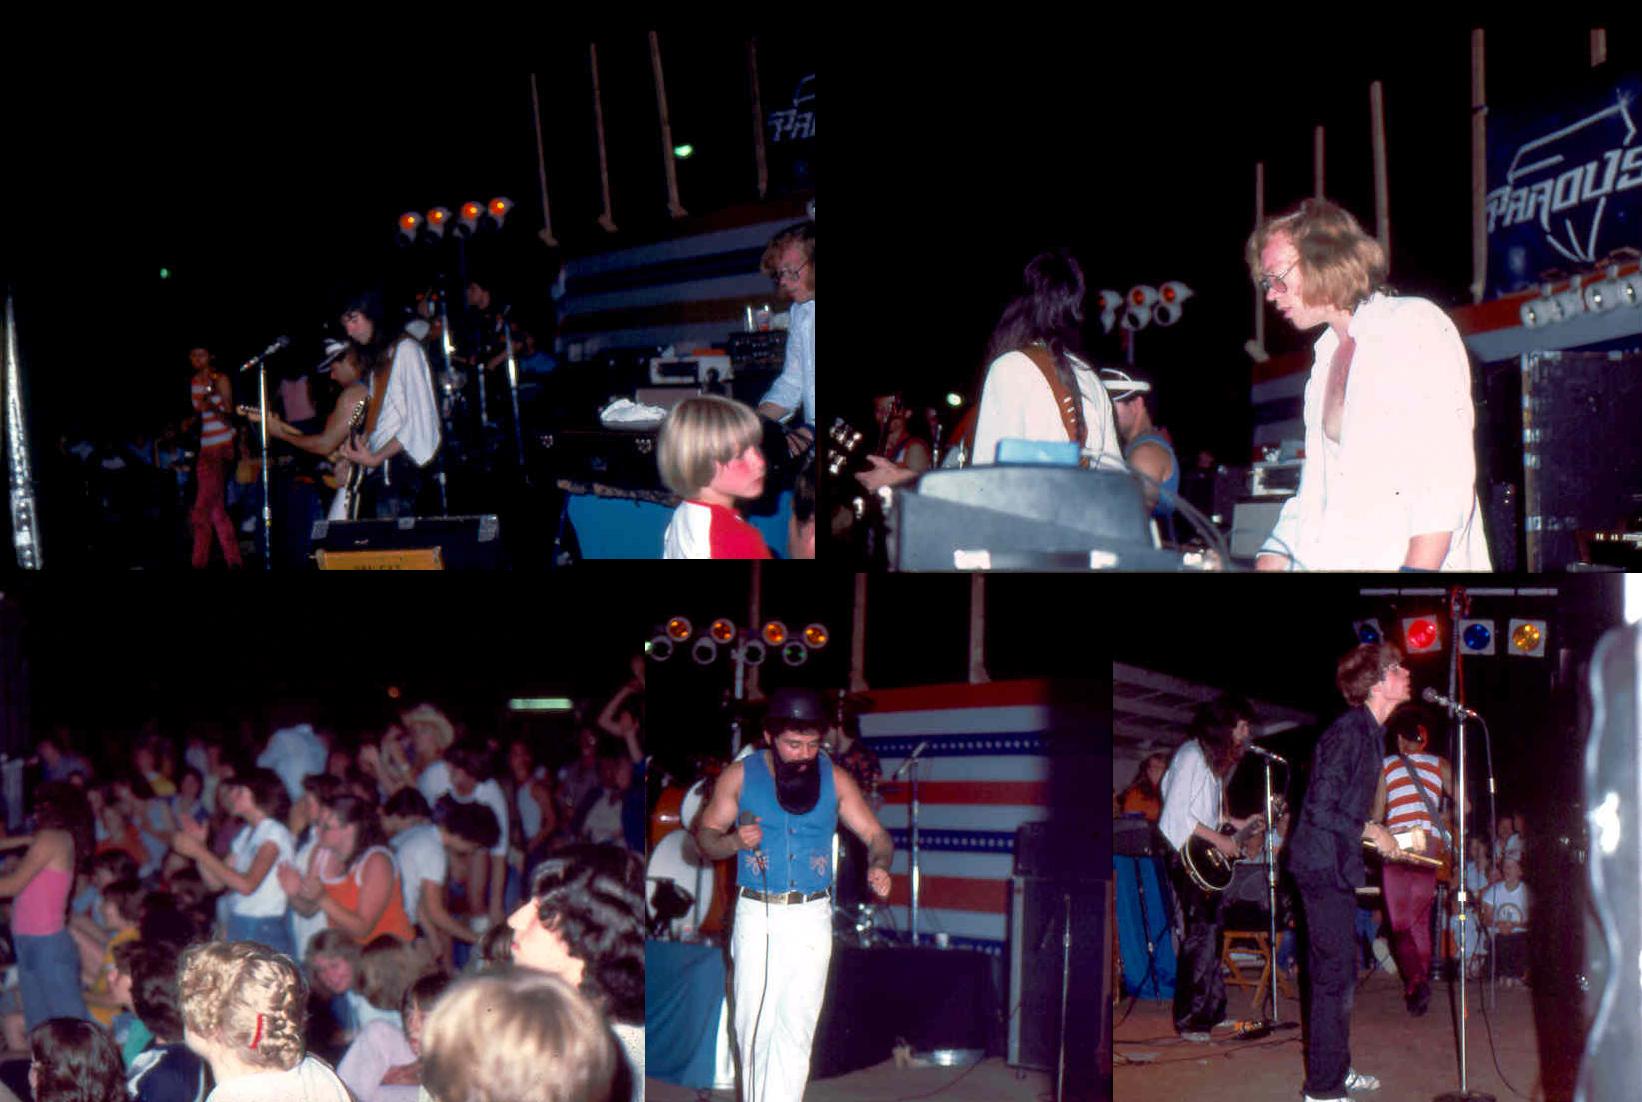 Parousia concert at Riverside Park – July 3rd 1981